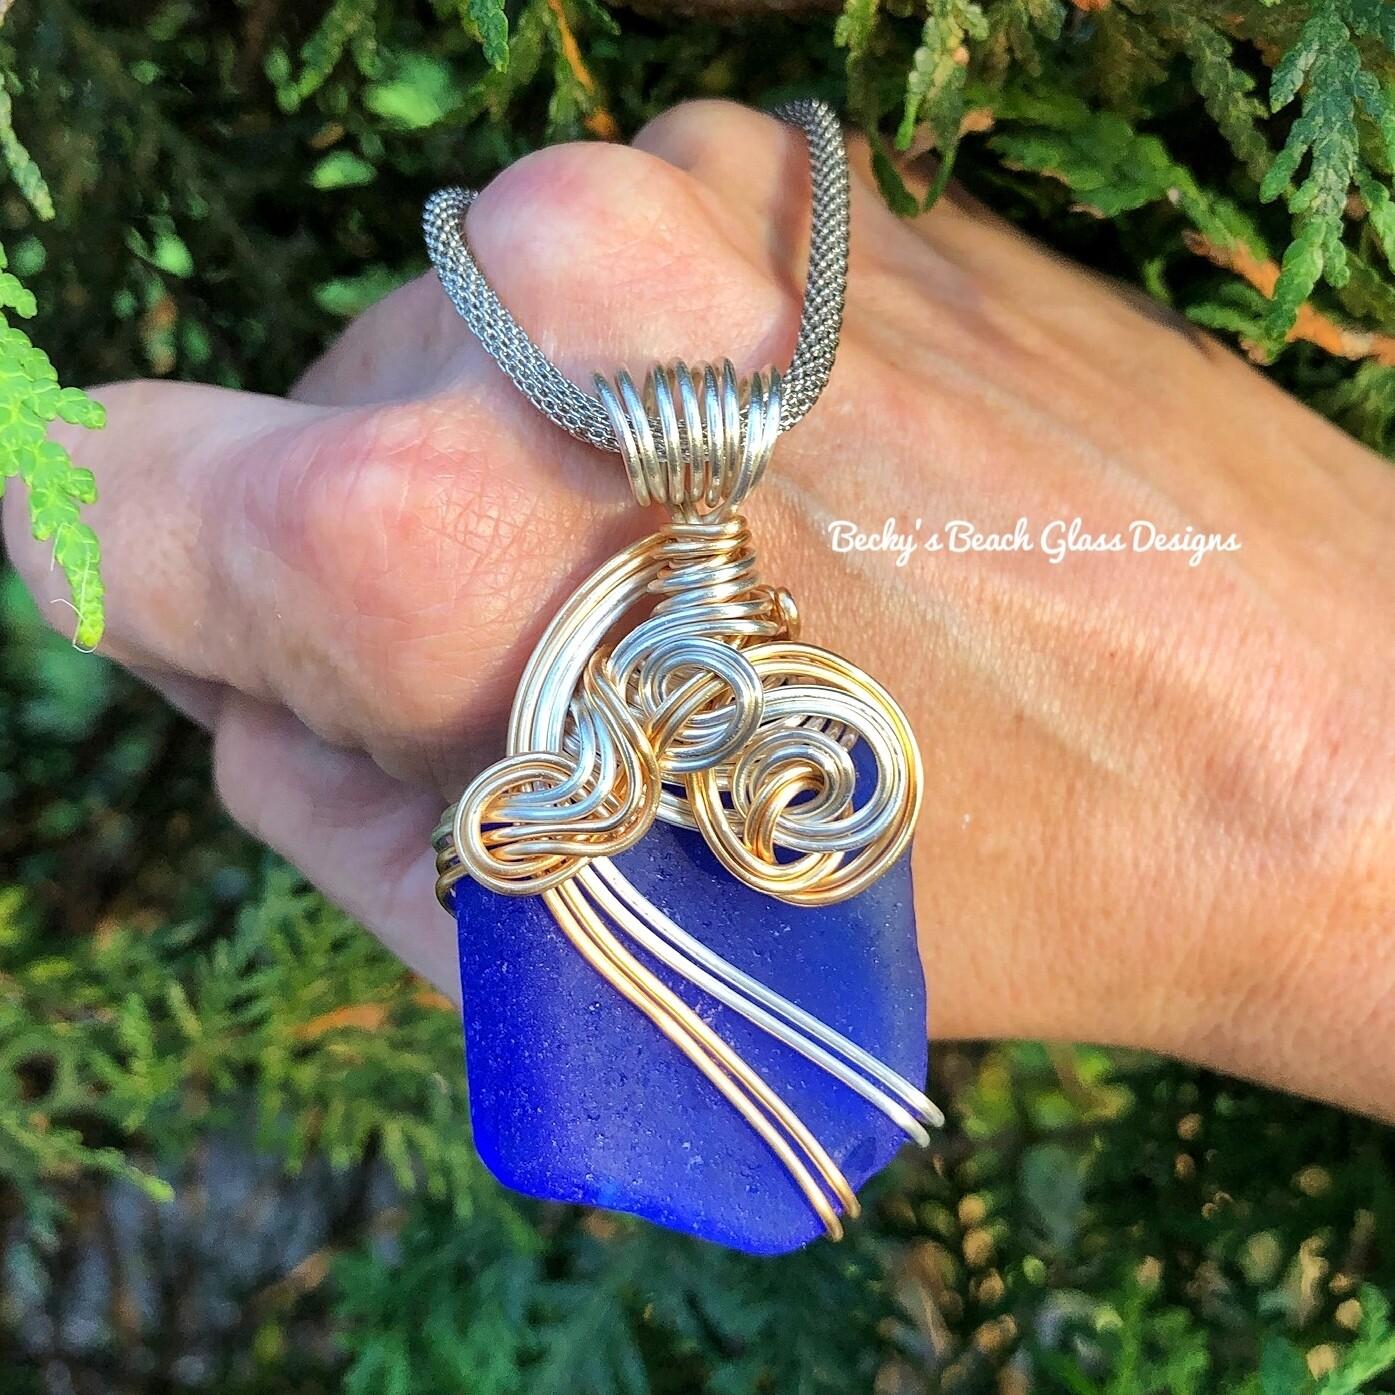 Cobalt Blue Mixed Metal Sea Glass Necklace